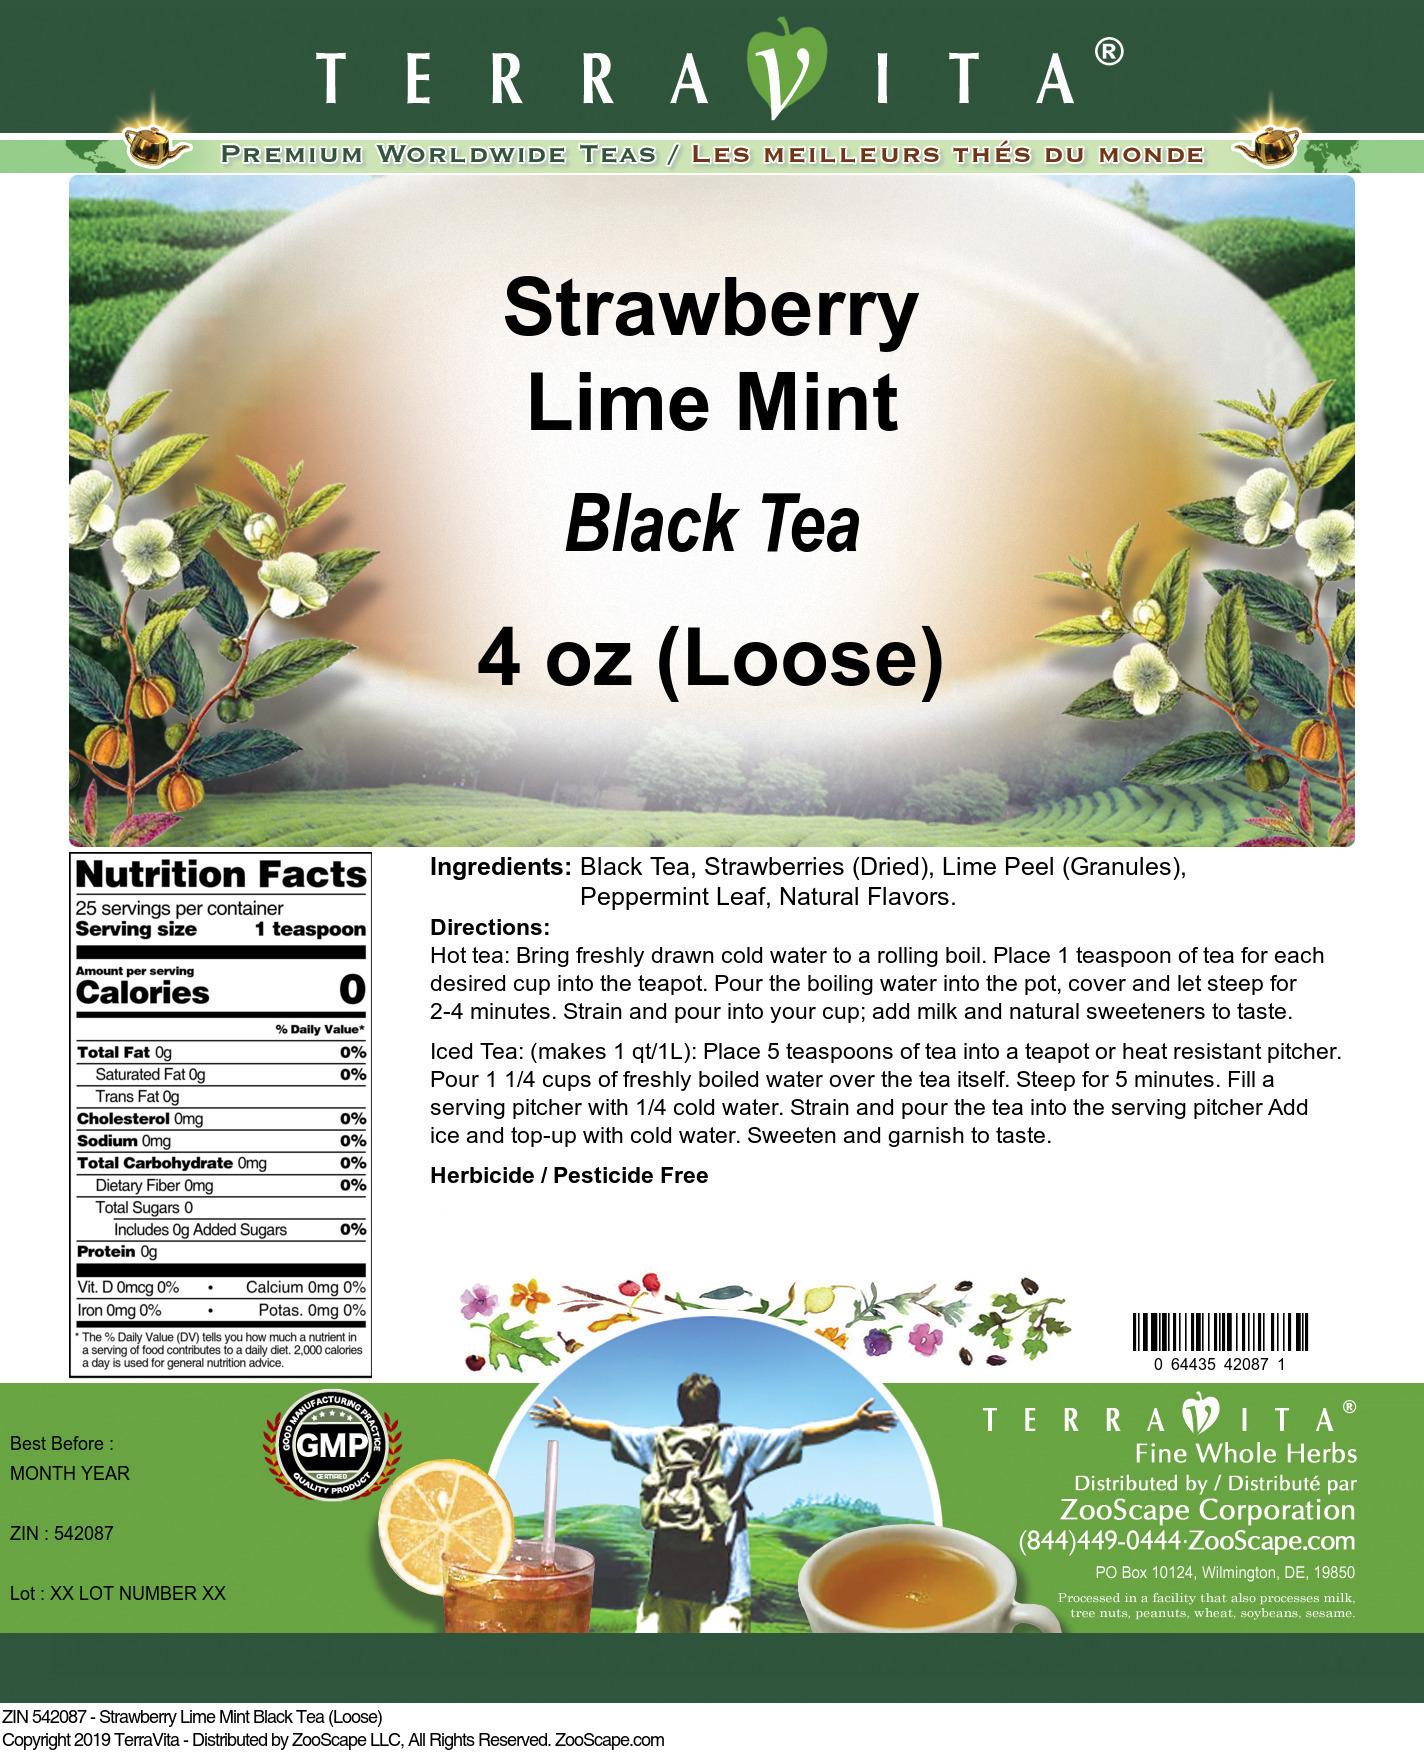 Strawberry Lime Mint Black Tea (Loose)